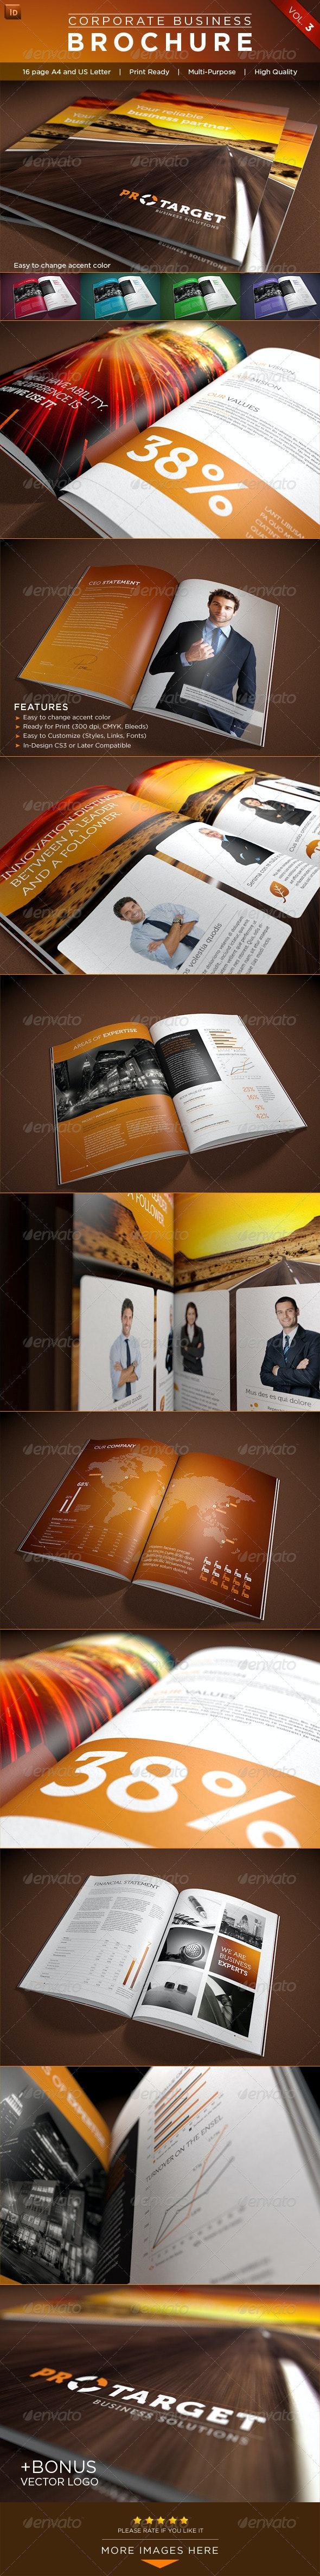 Corporate Business Brochure Vol. 3 - Brochures Print Templates